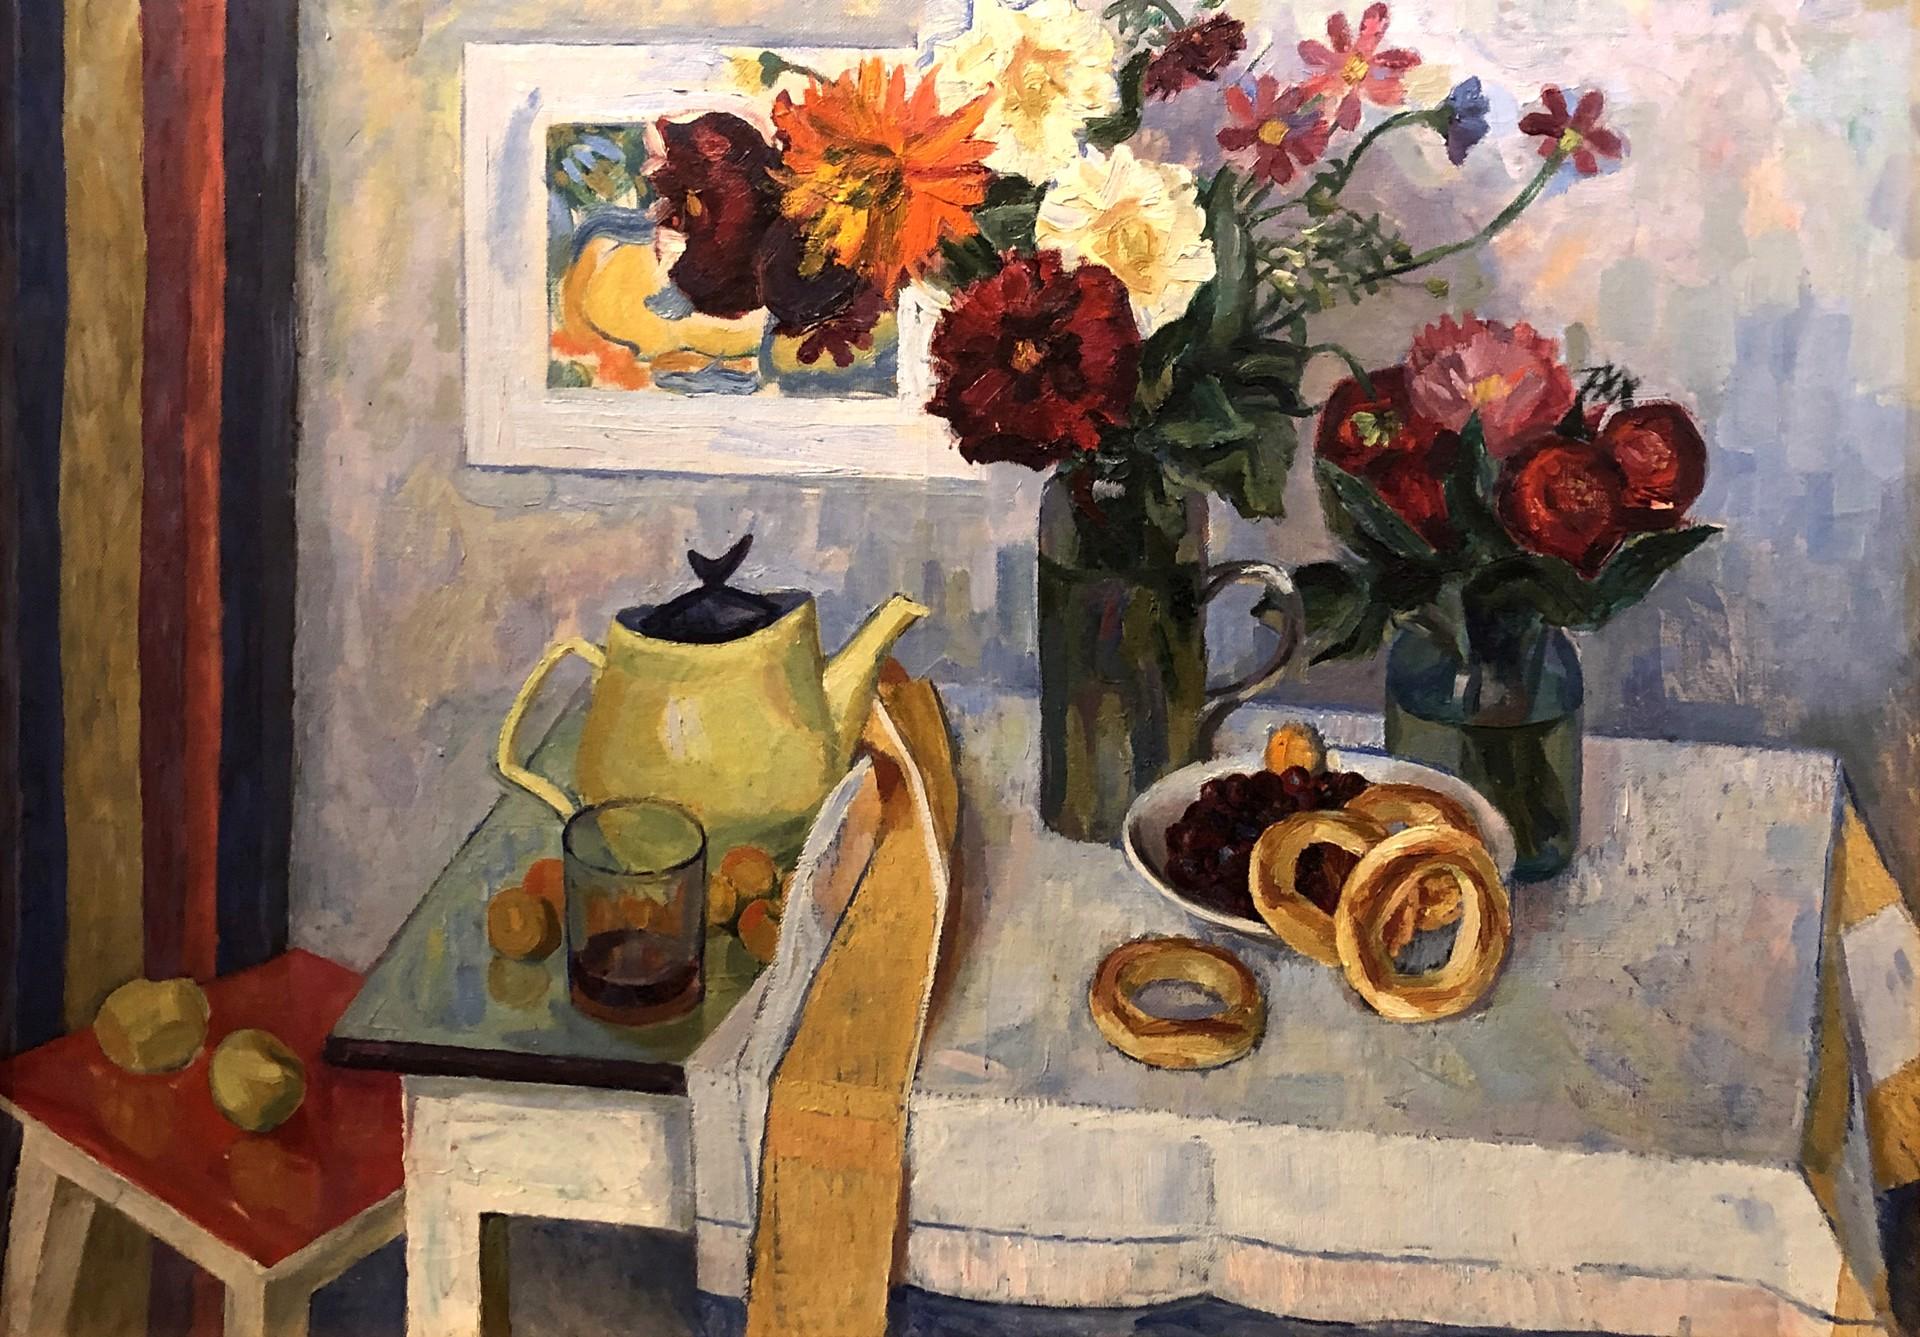 Eduard Ivanovich Astashev - Still Life by Russian Artists